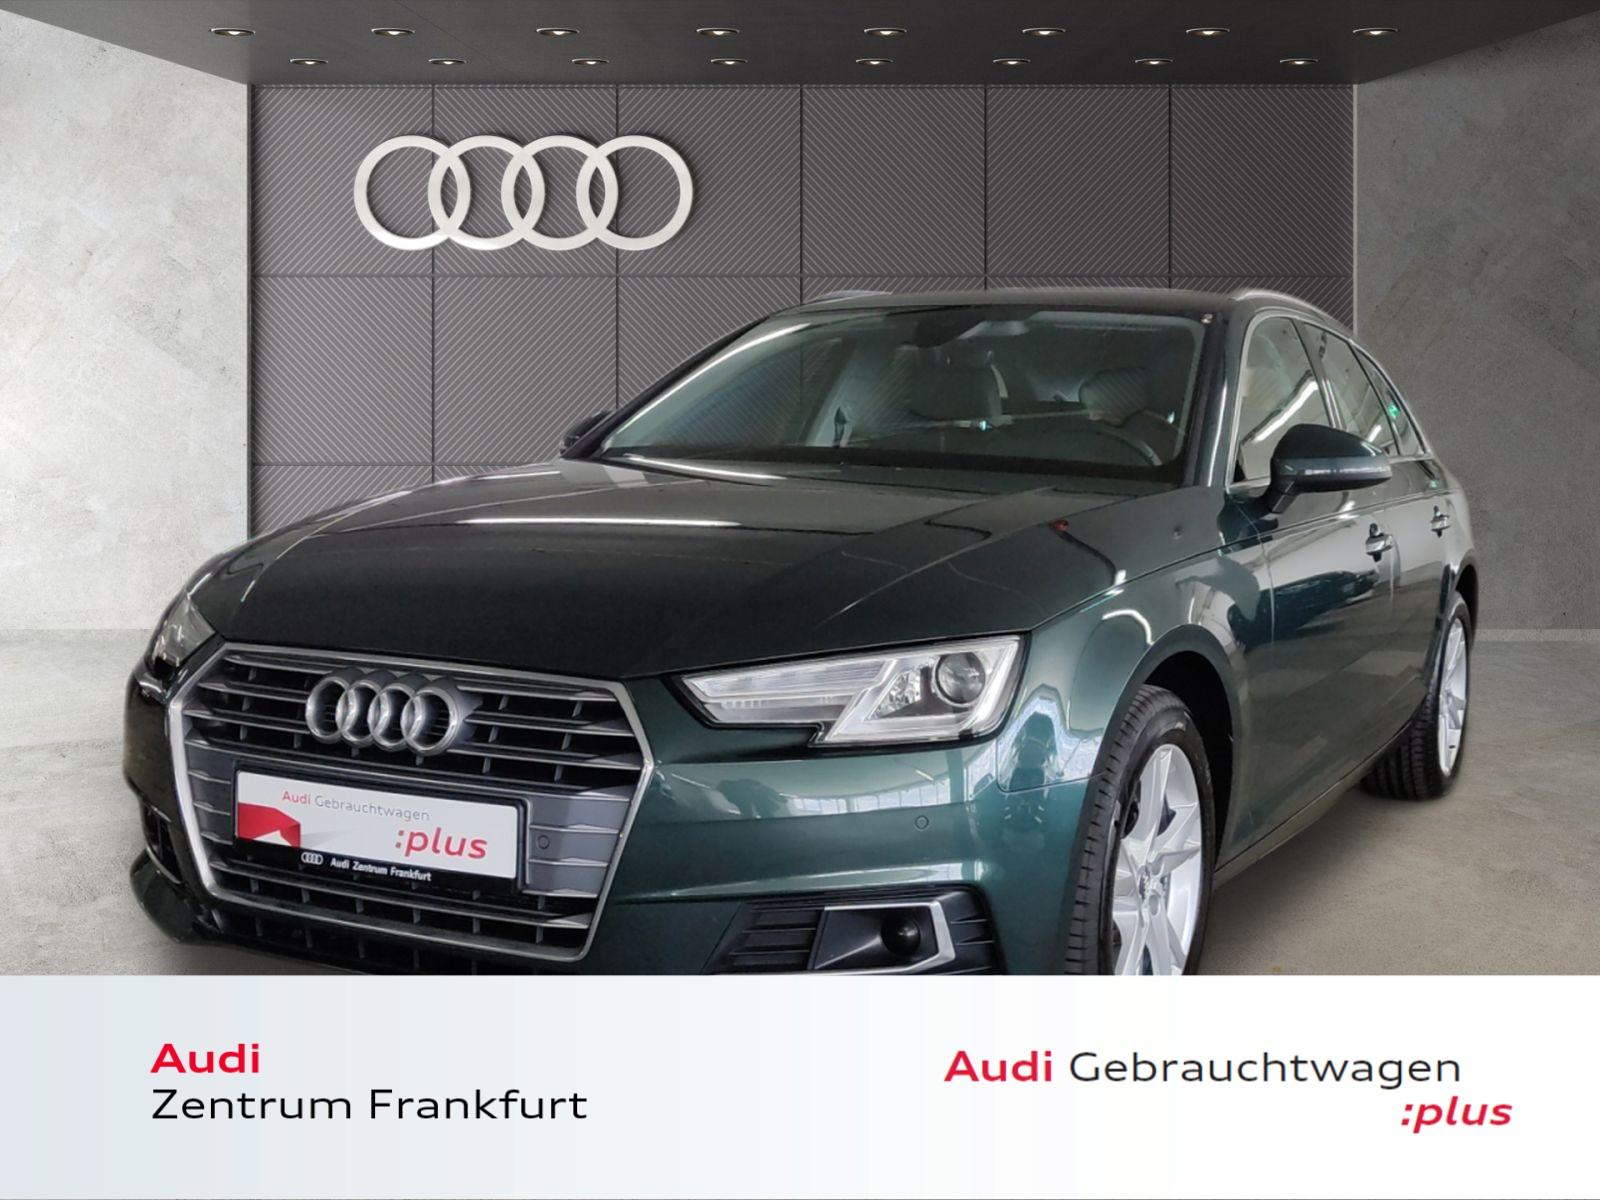 Audi A4 Avant 2.0 TDI sport Navi Xenon Tempomat PDC Sitzheizung, Jahr 2018, Diesel